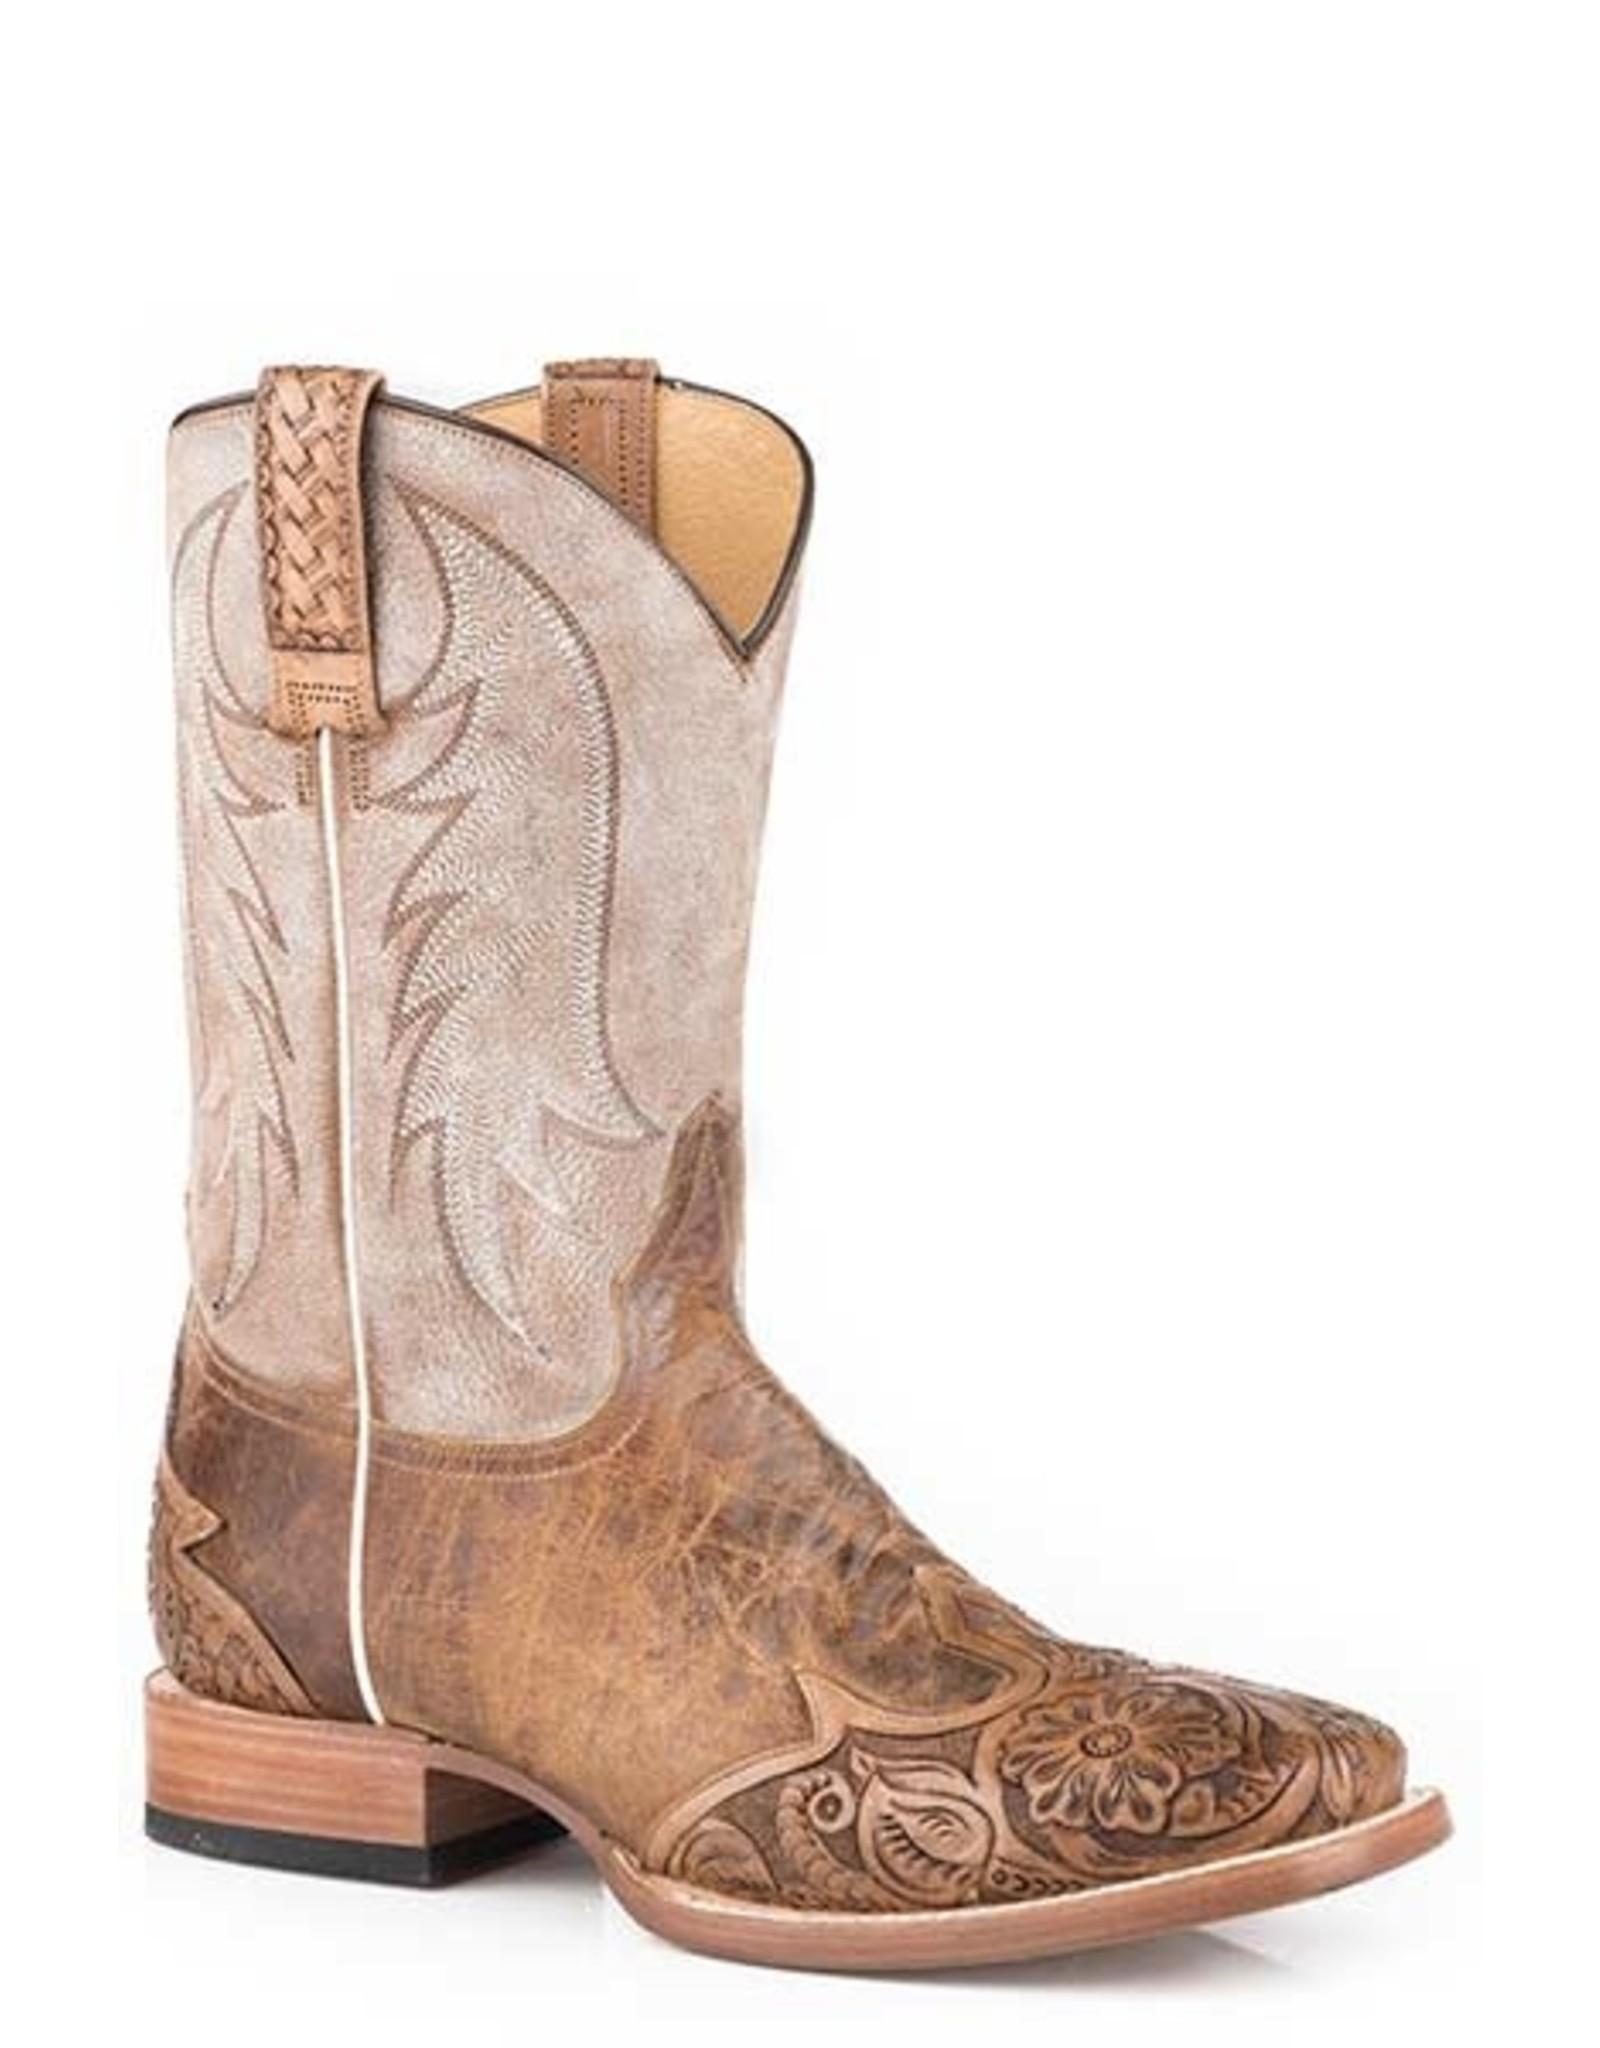 Boots-Men STETSON 12-020-8872-4035 Deigo